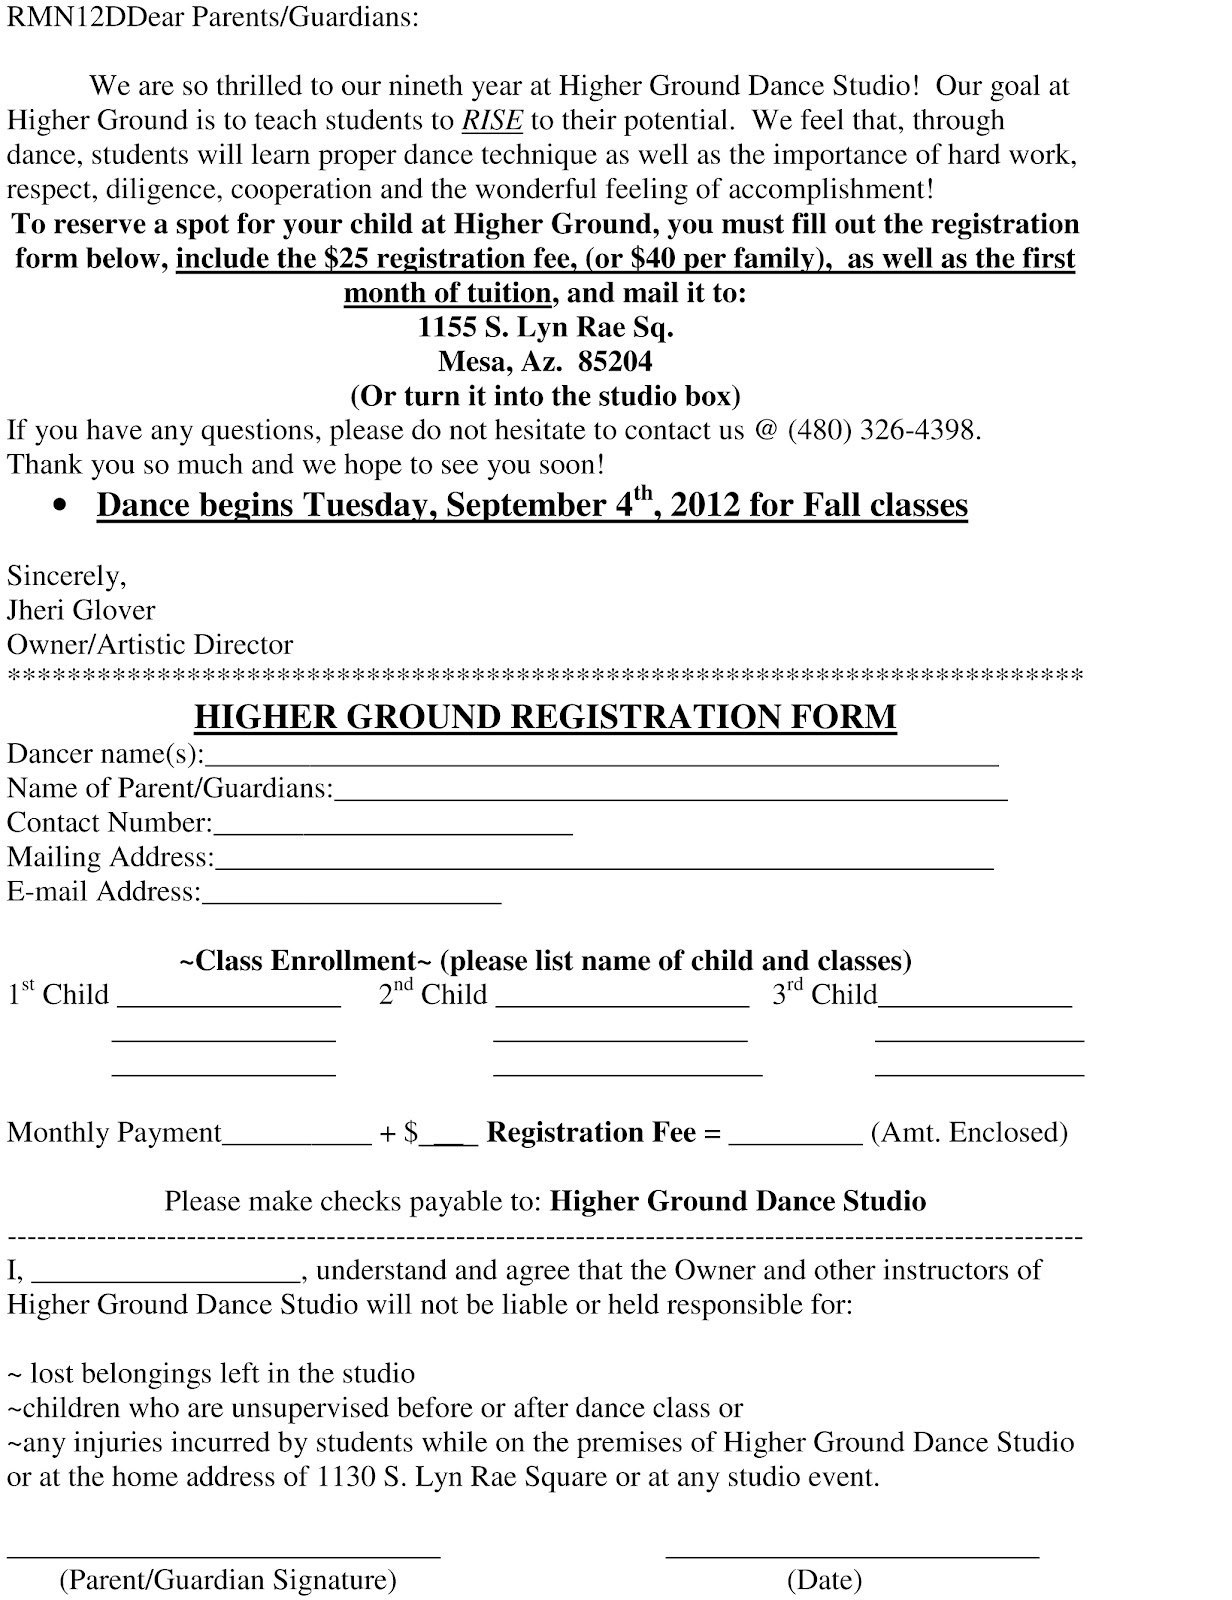 Higher Ground Dance Studio: Registration Form and Dance Policies